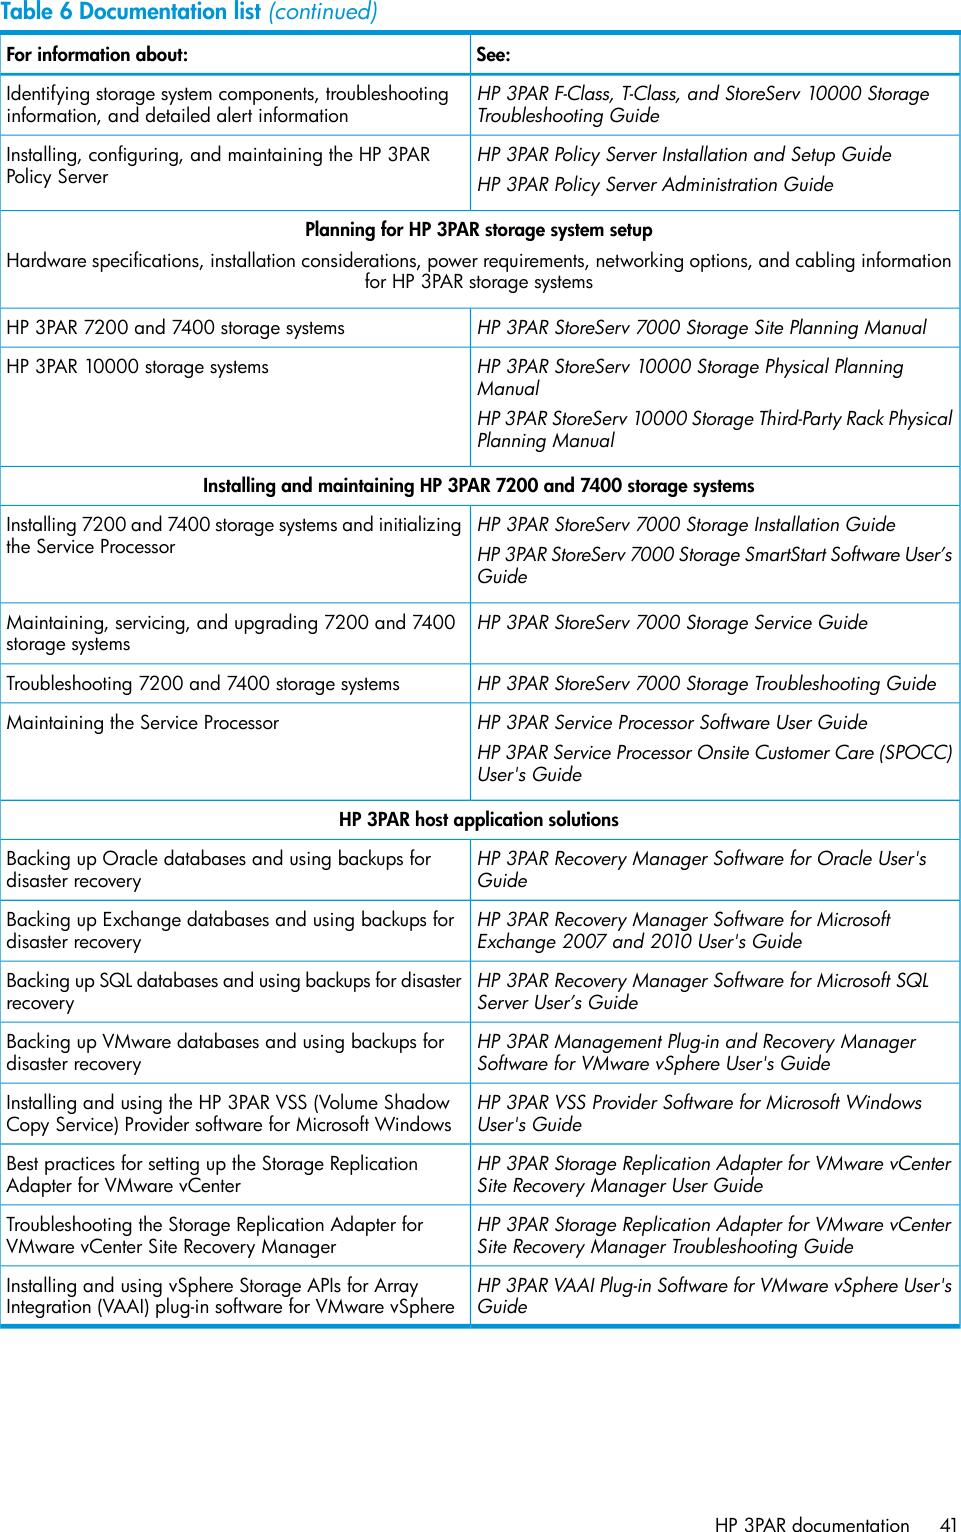 Hp 3Par System Replication Adapter Software Ql227 For Vmware